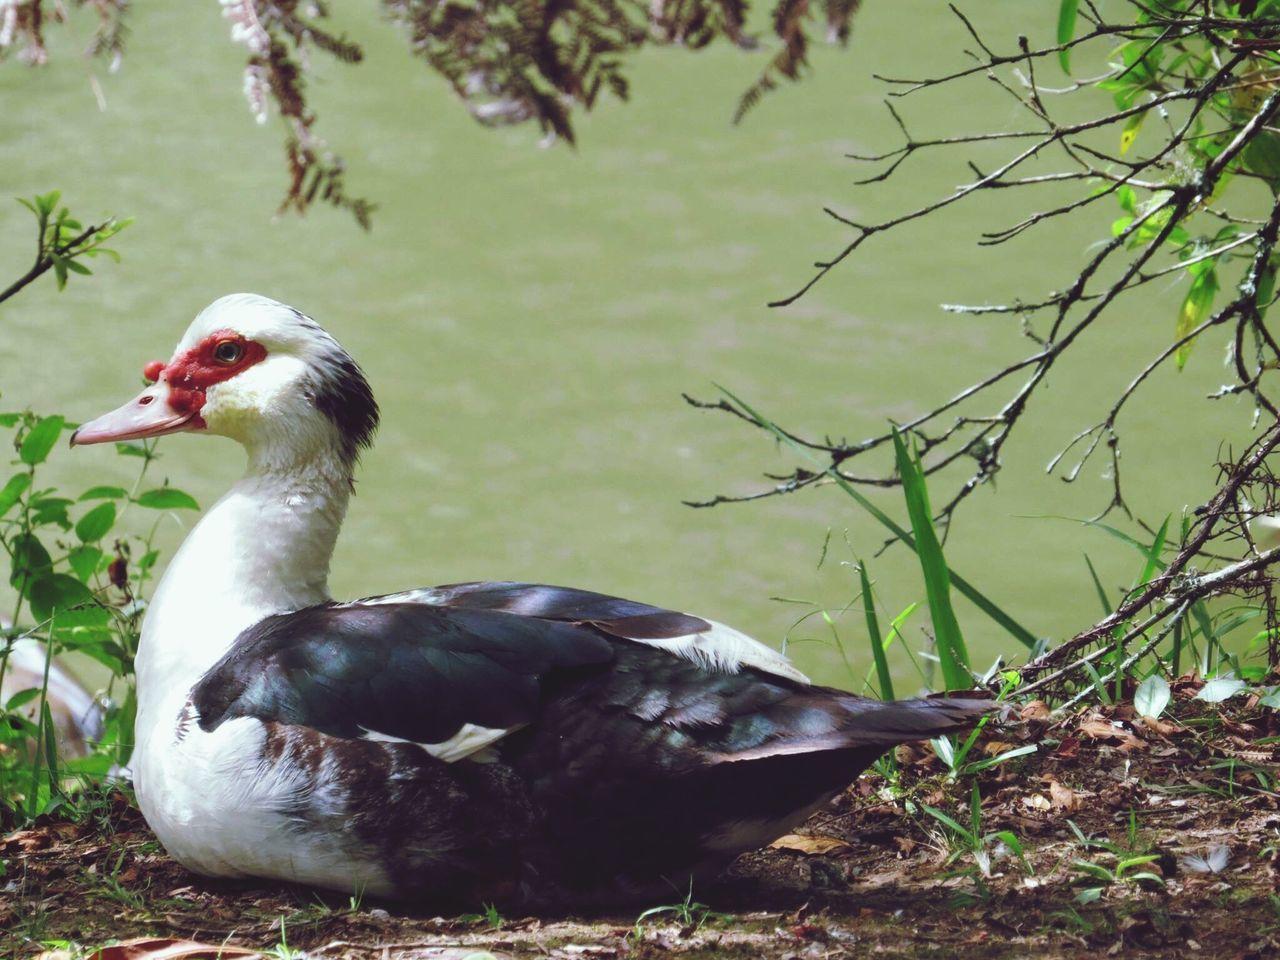 Lagonegro Gramado Brasil Travel Pic Bestoftheday Zoom Canon Bird Nature Water